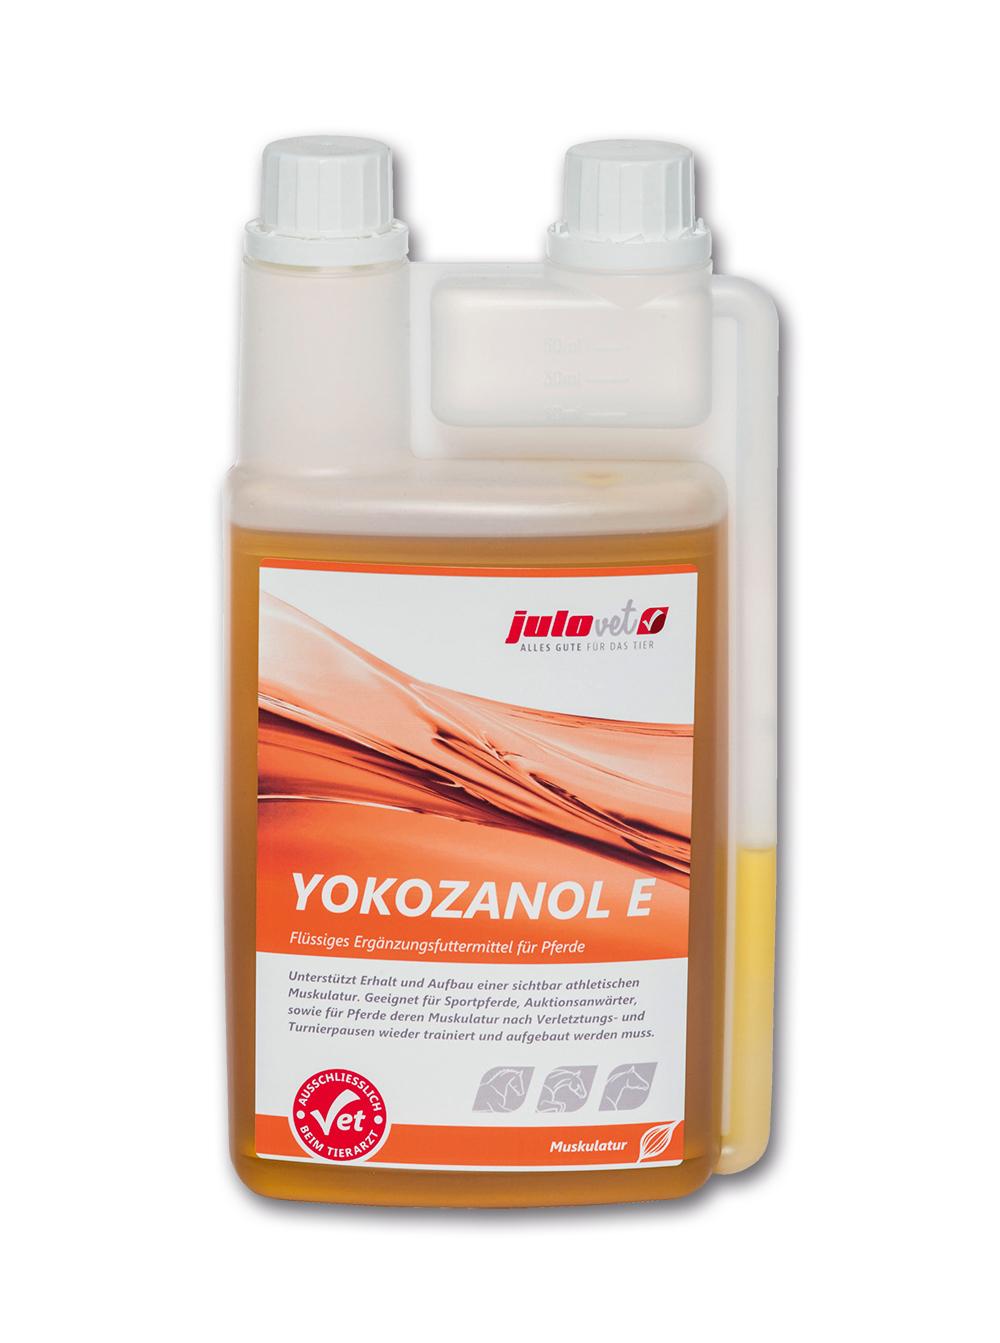 Yokozanol E